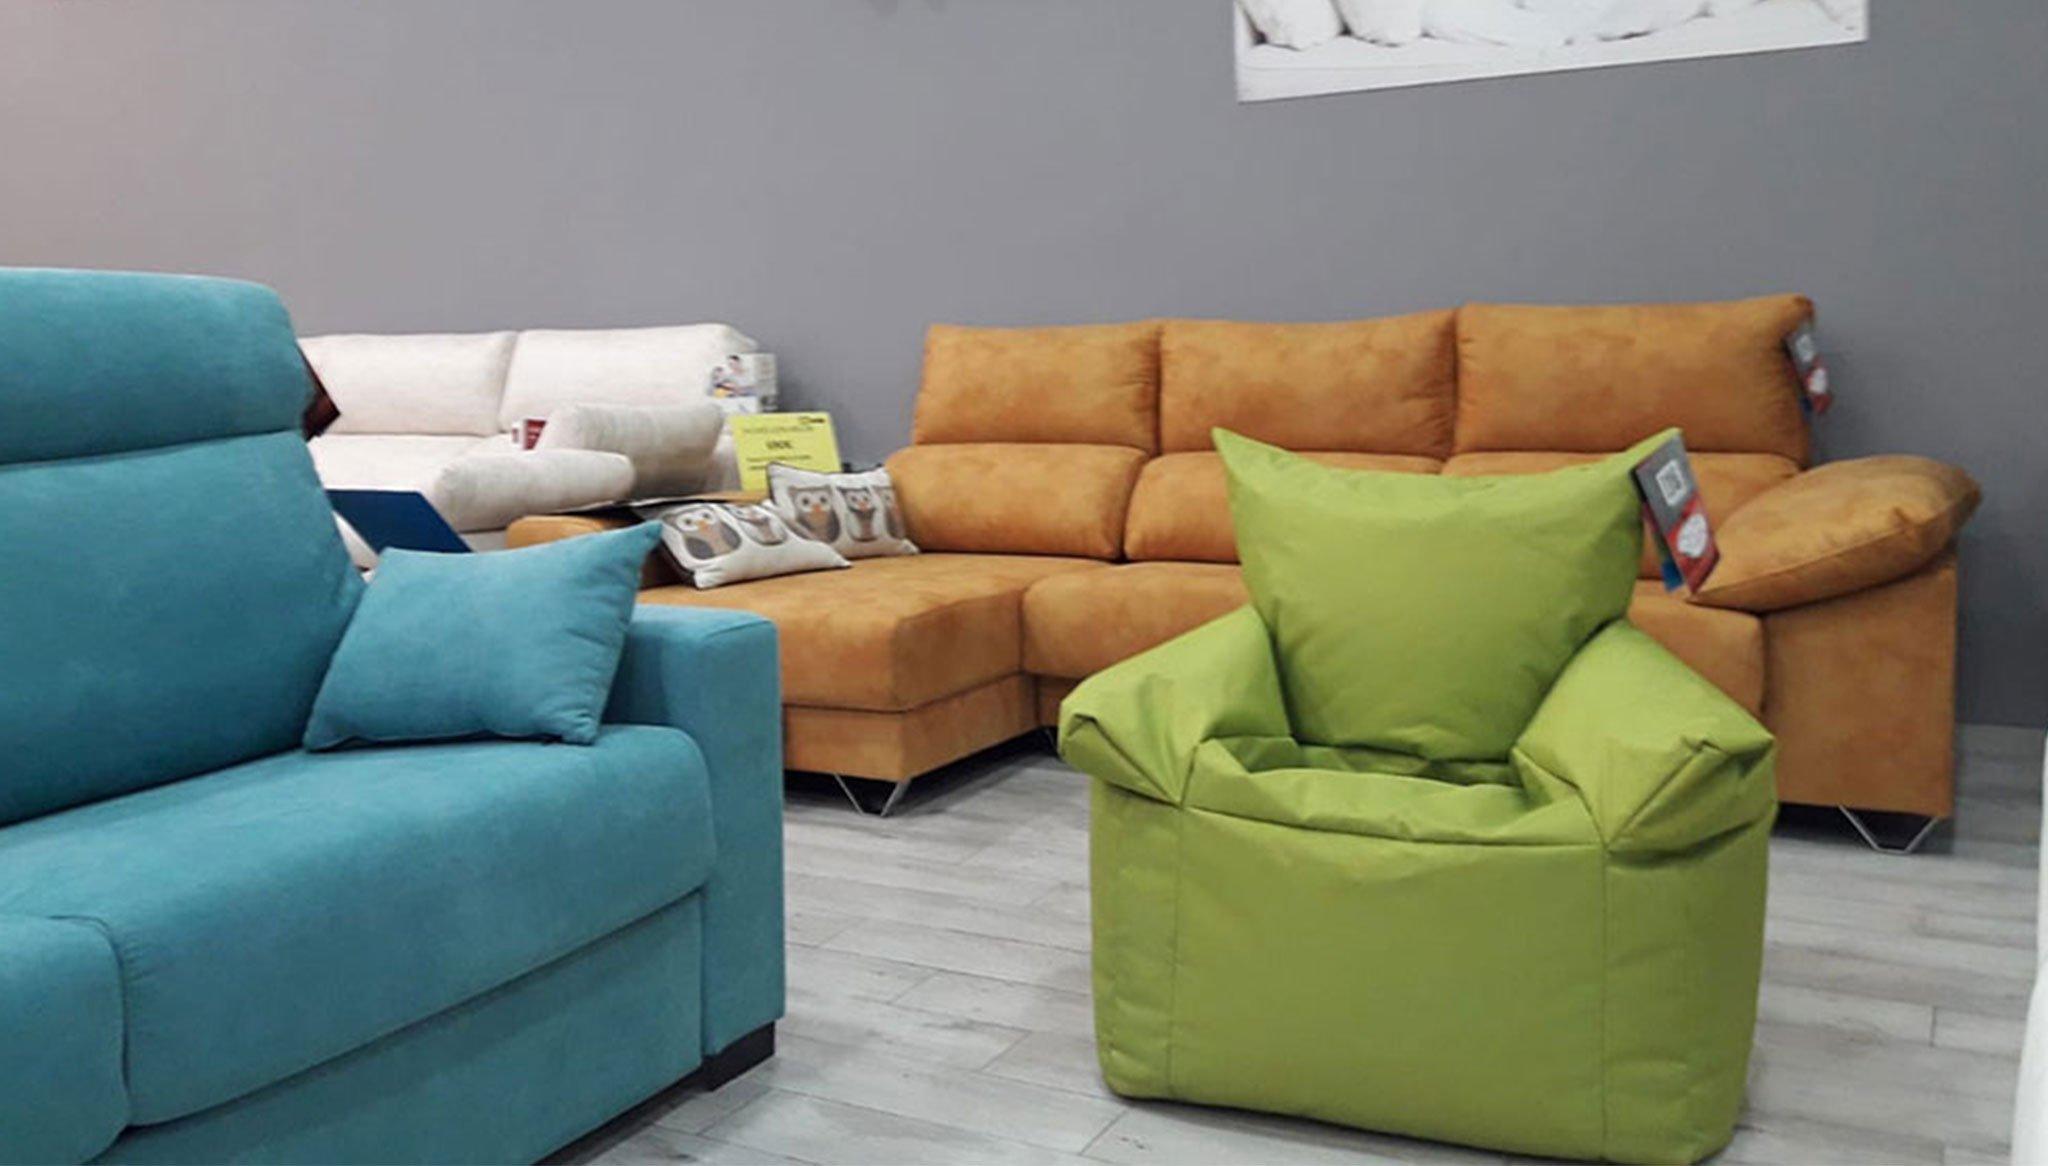 Green Pouff raffling Ok Sofas